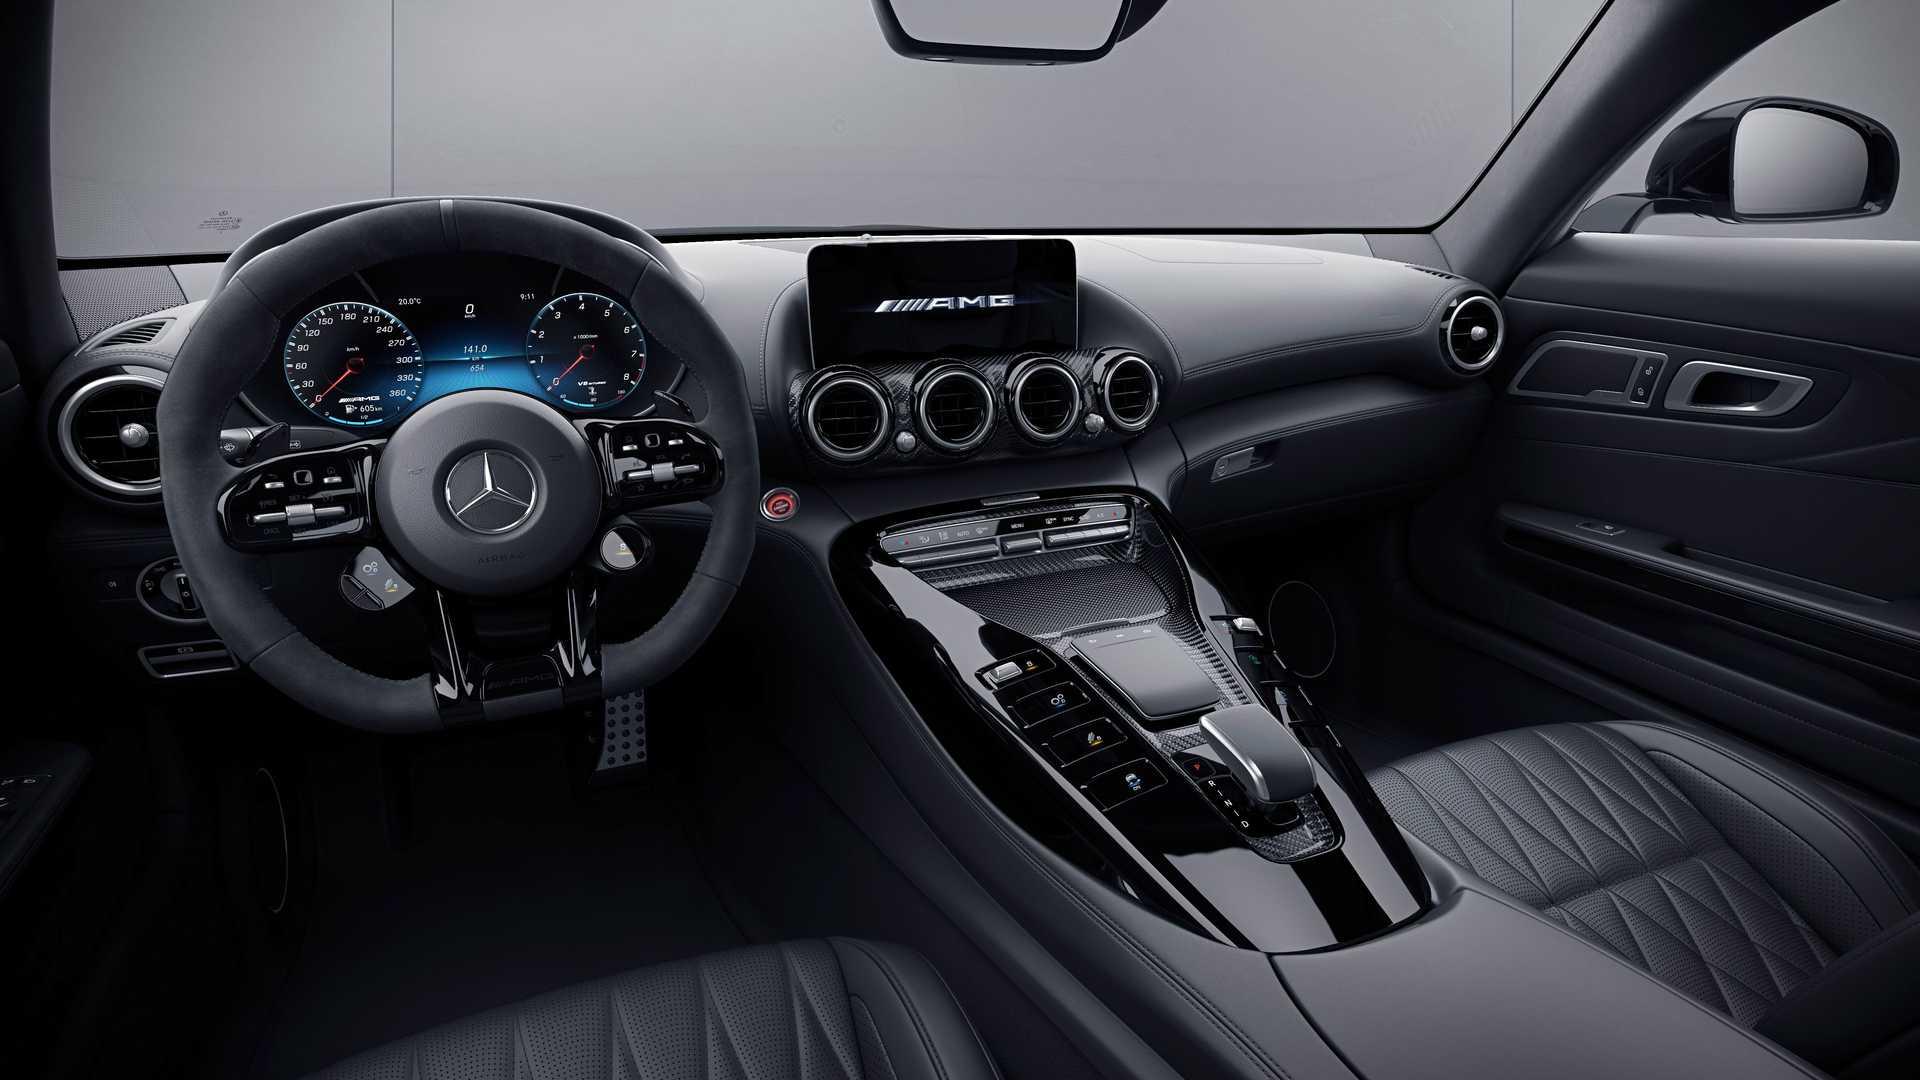 Mercedes-AMG GT Coupe ön konsol